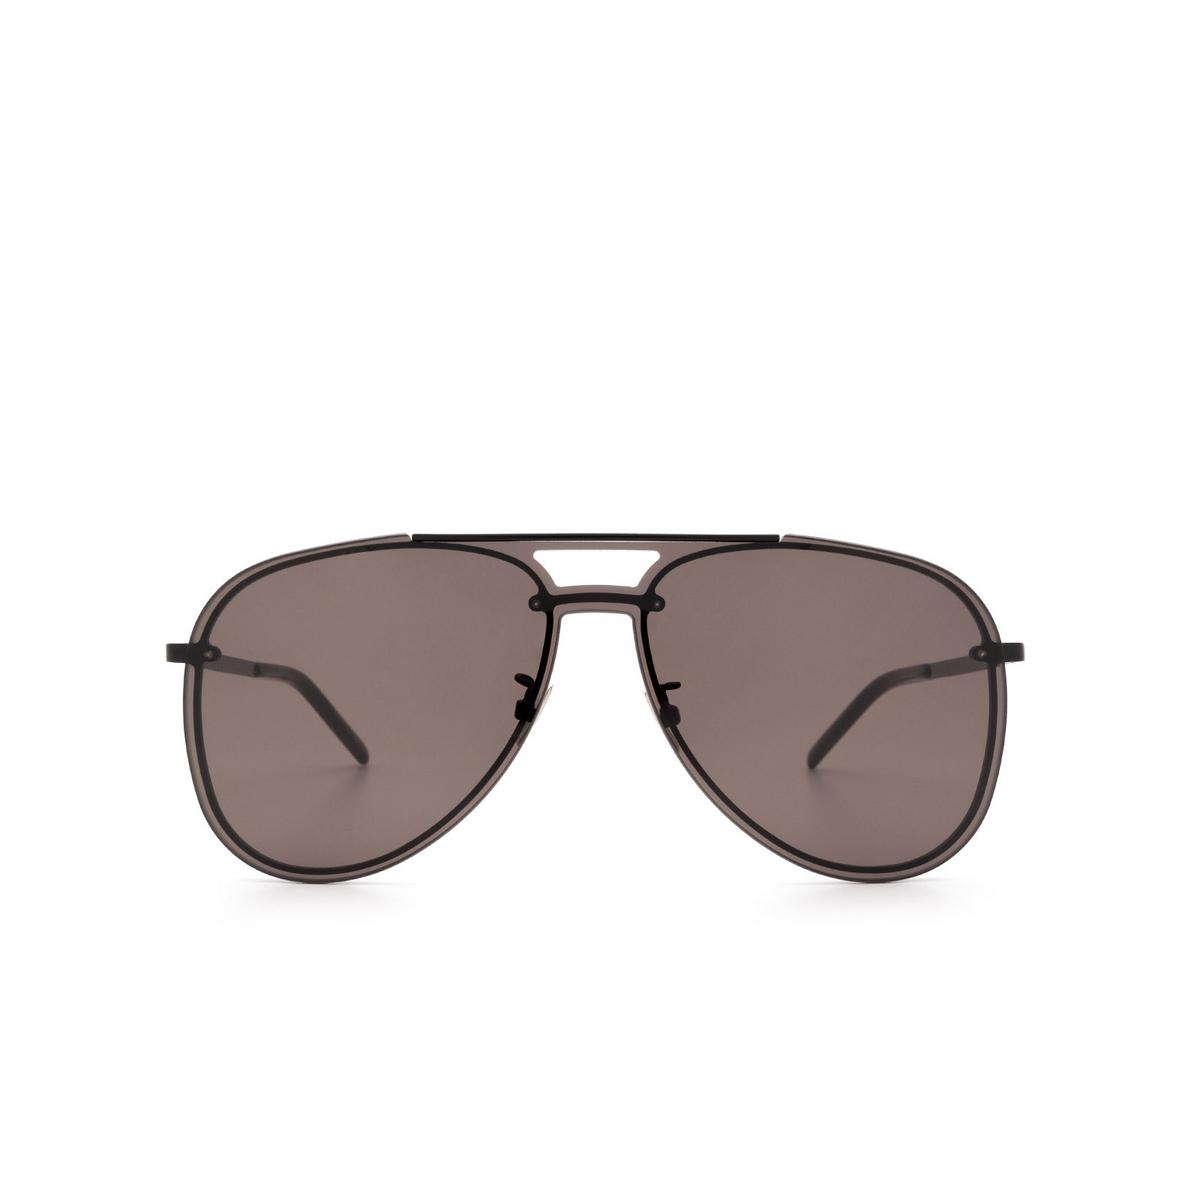 Saint Laurent® Aviator Sunglasses: CLASSIC 11 MASK color Black 002 - 1/3.